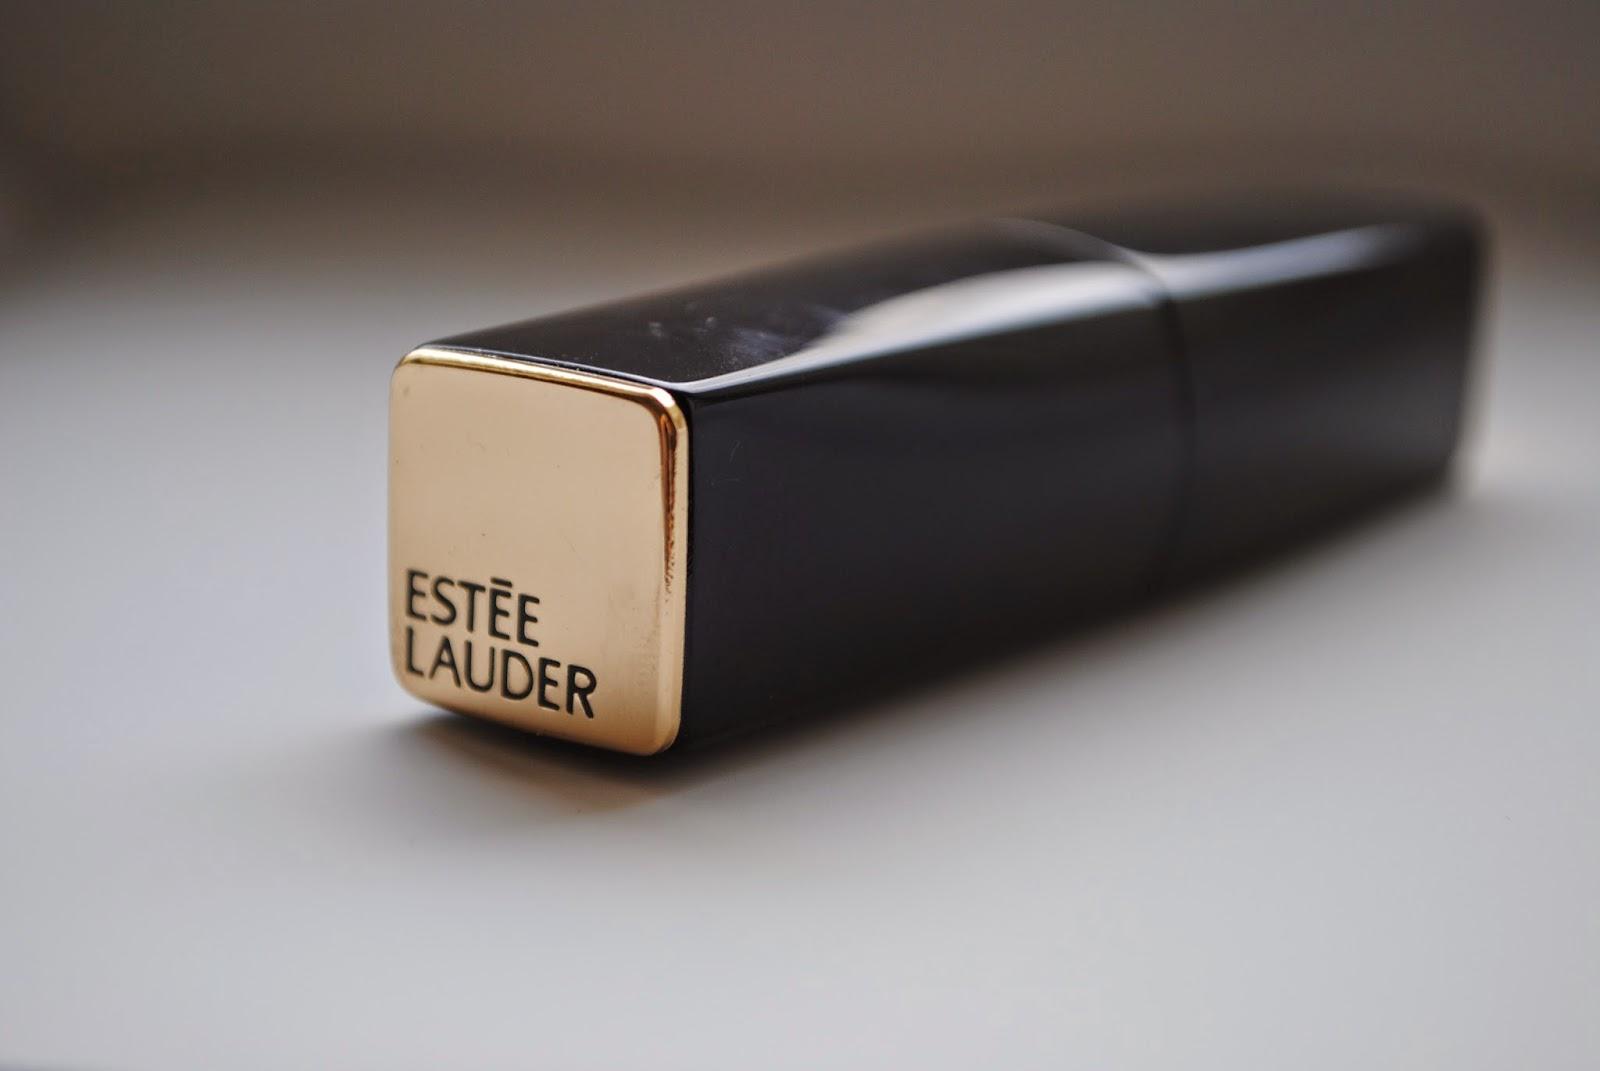 Estee Lauder Pure Color Envy Shine Inspiring